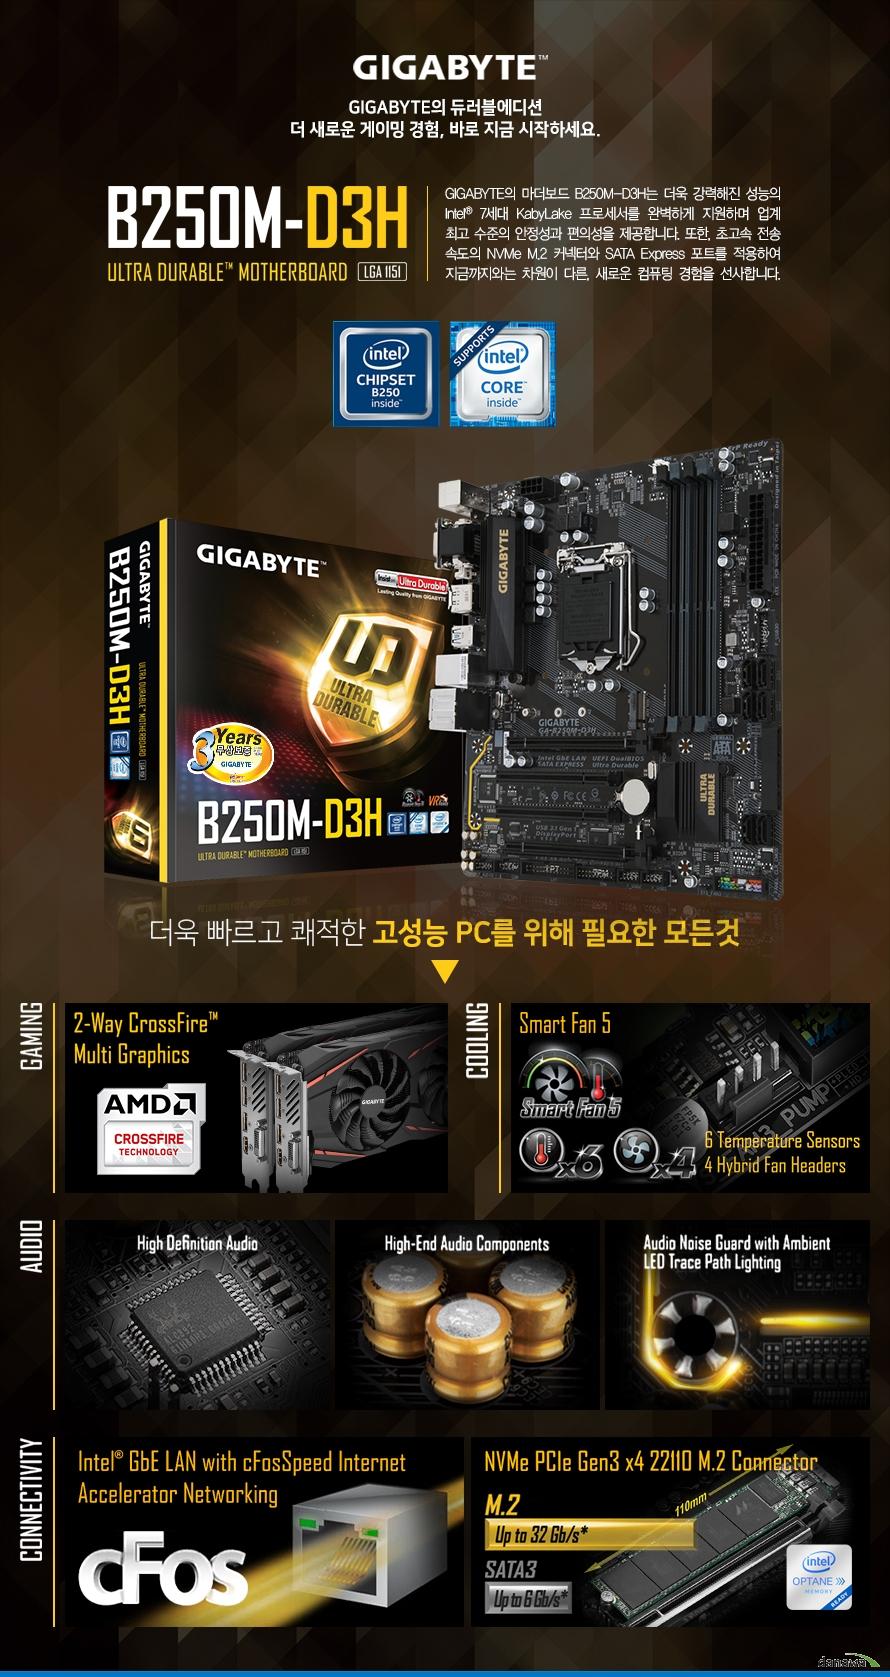 GIGABYTE의 마더보드 B250M-D3H는 더욱 강력해진 성능의 Intel 7세대 KabyLake 프로세서를 완벽하게 지원하며 업계 최고 수준의 안정성과 편의성을 제공합니다. 또한, 초고속 전송 속도의 NVMe M.2 커넥터와 SATA Express 포트를 적용하여 지금까지와는 차원이 다른, 새로운 컴퓨팅 경험을 선사합니다.